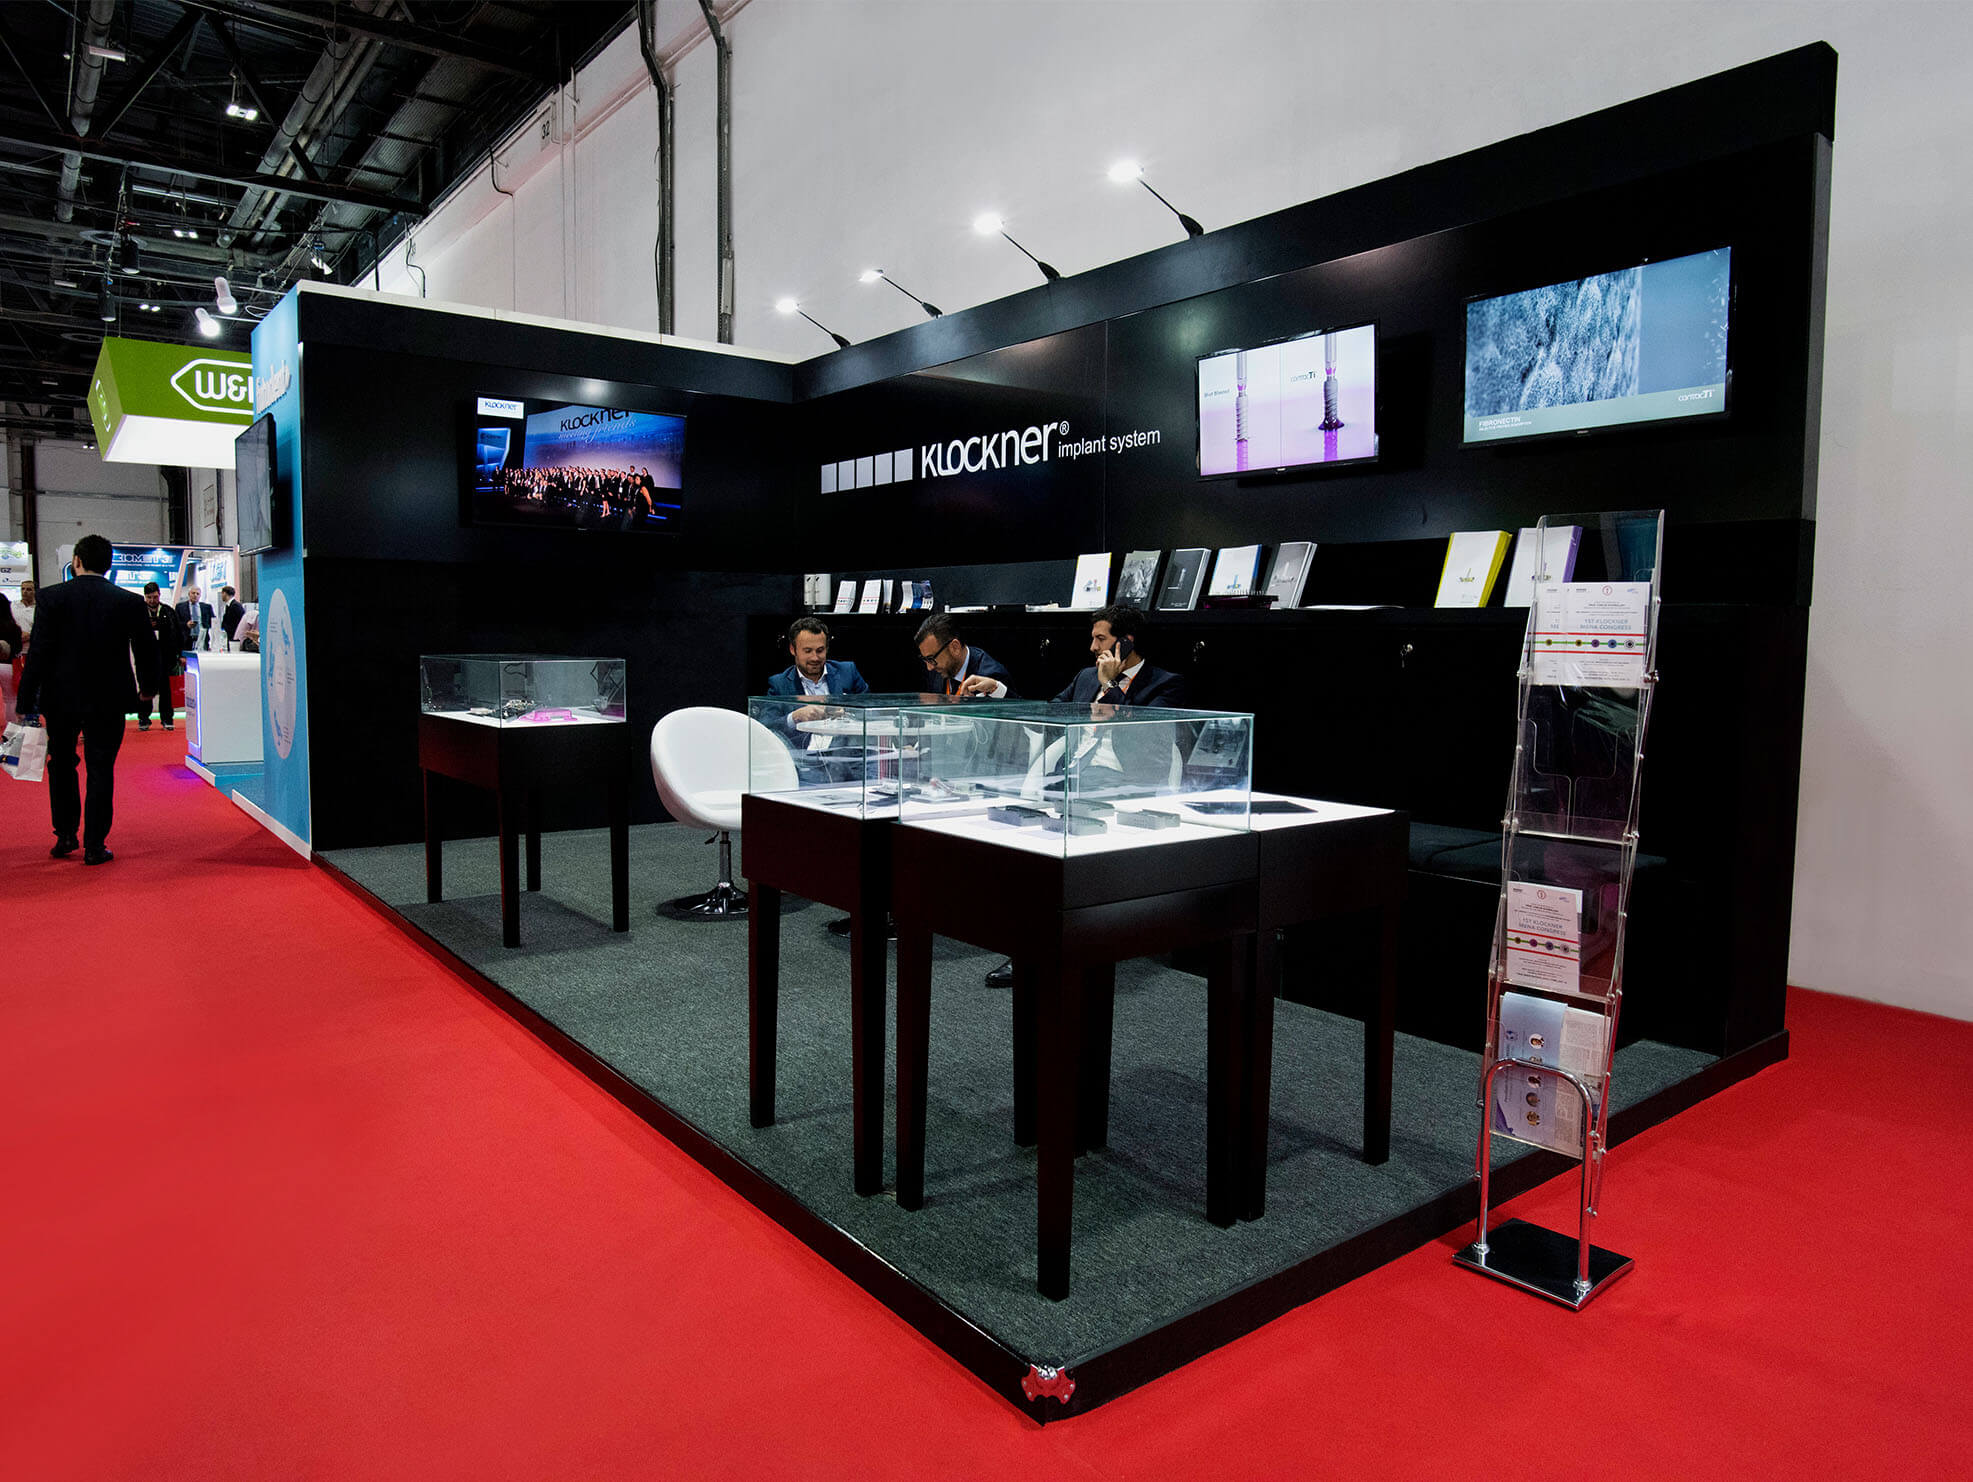 Kclockner trade show booth design